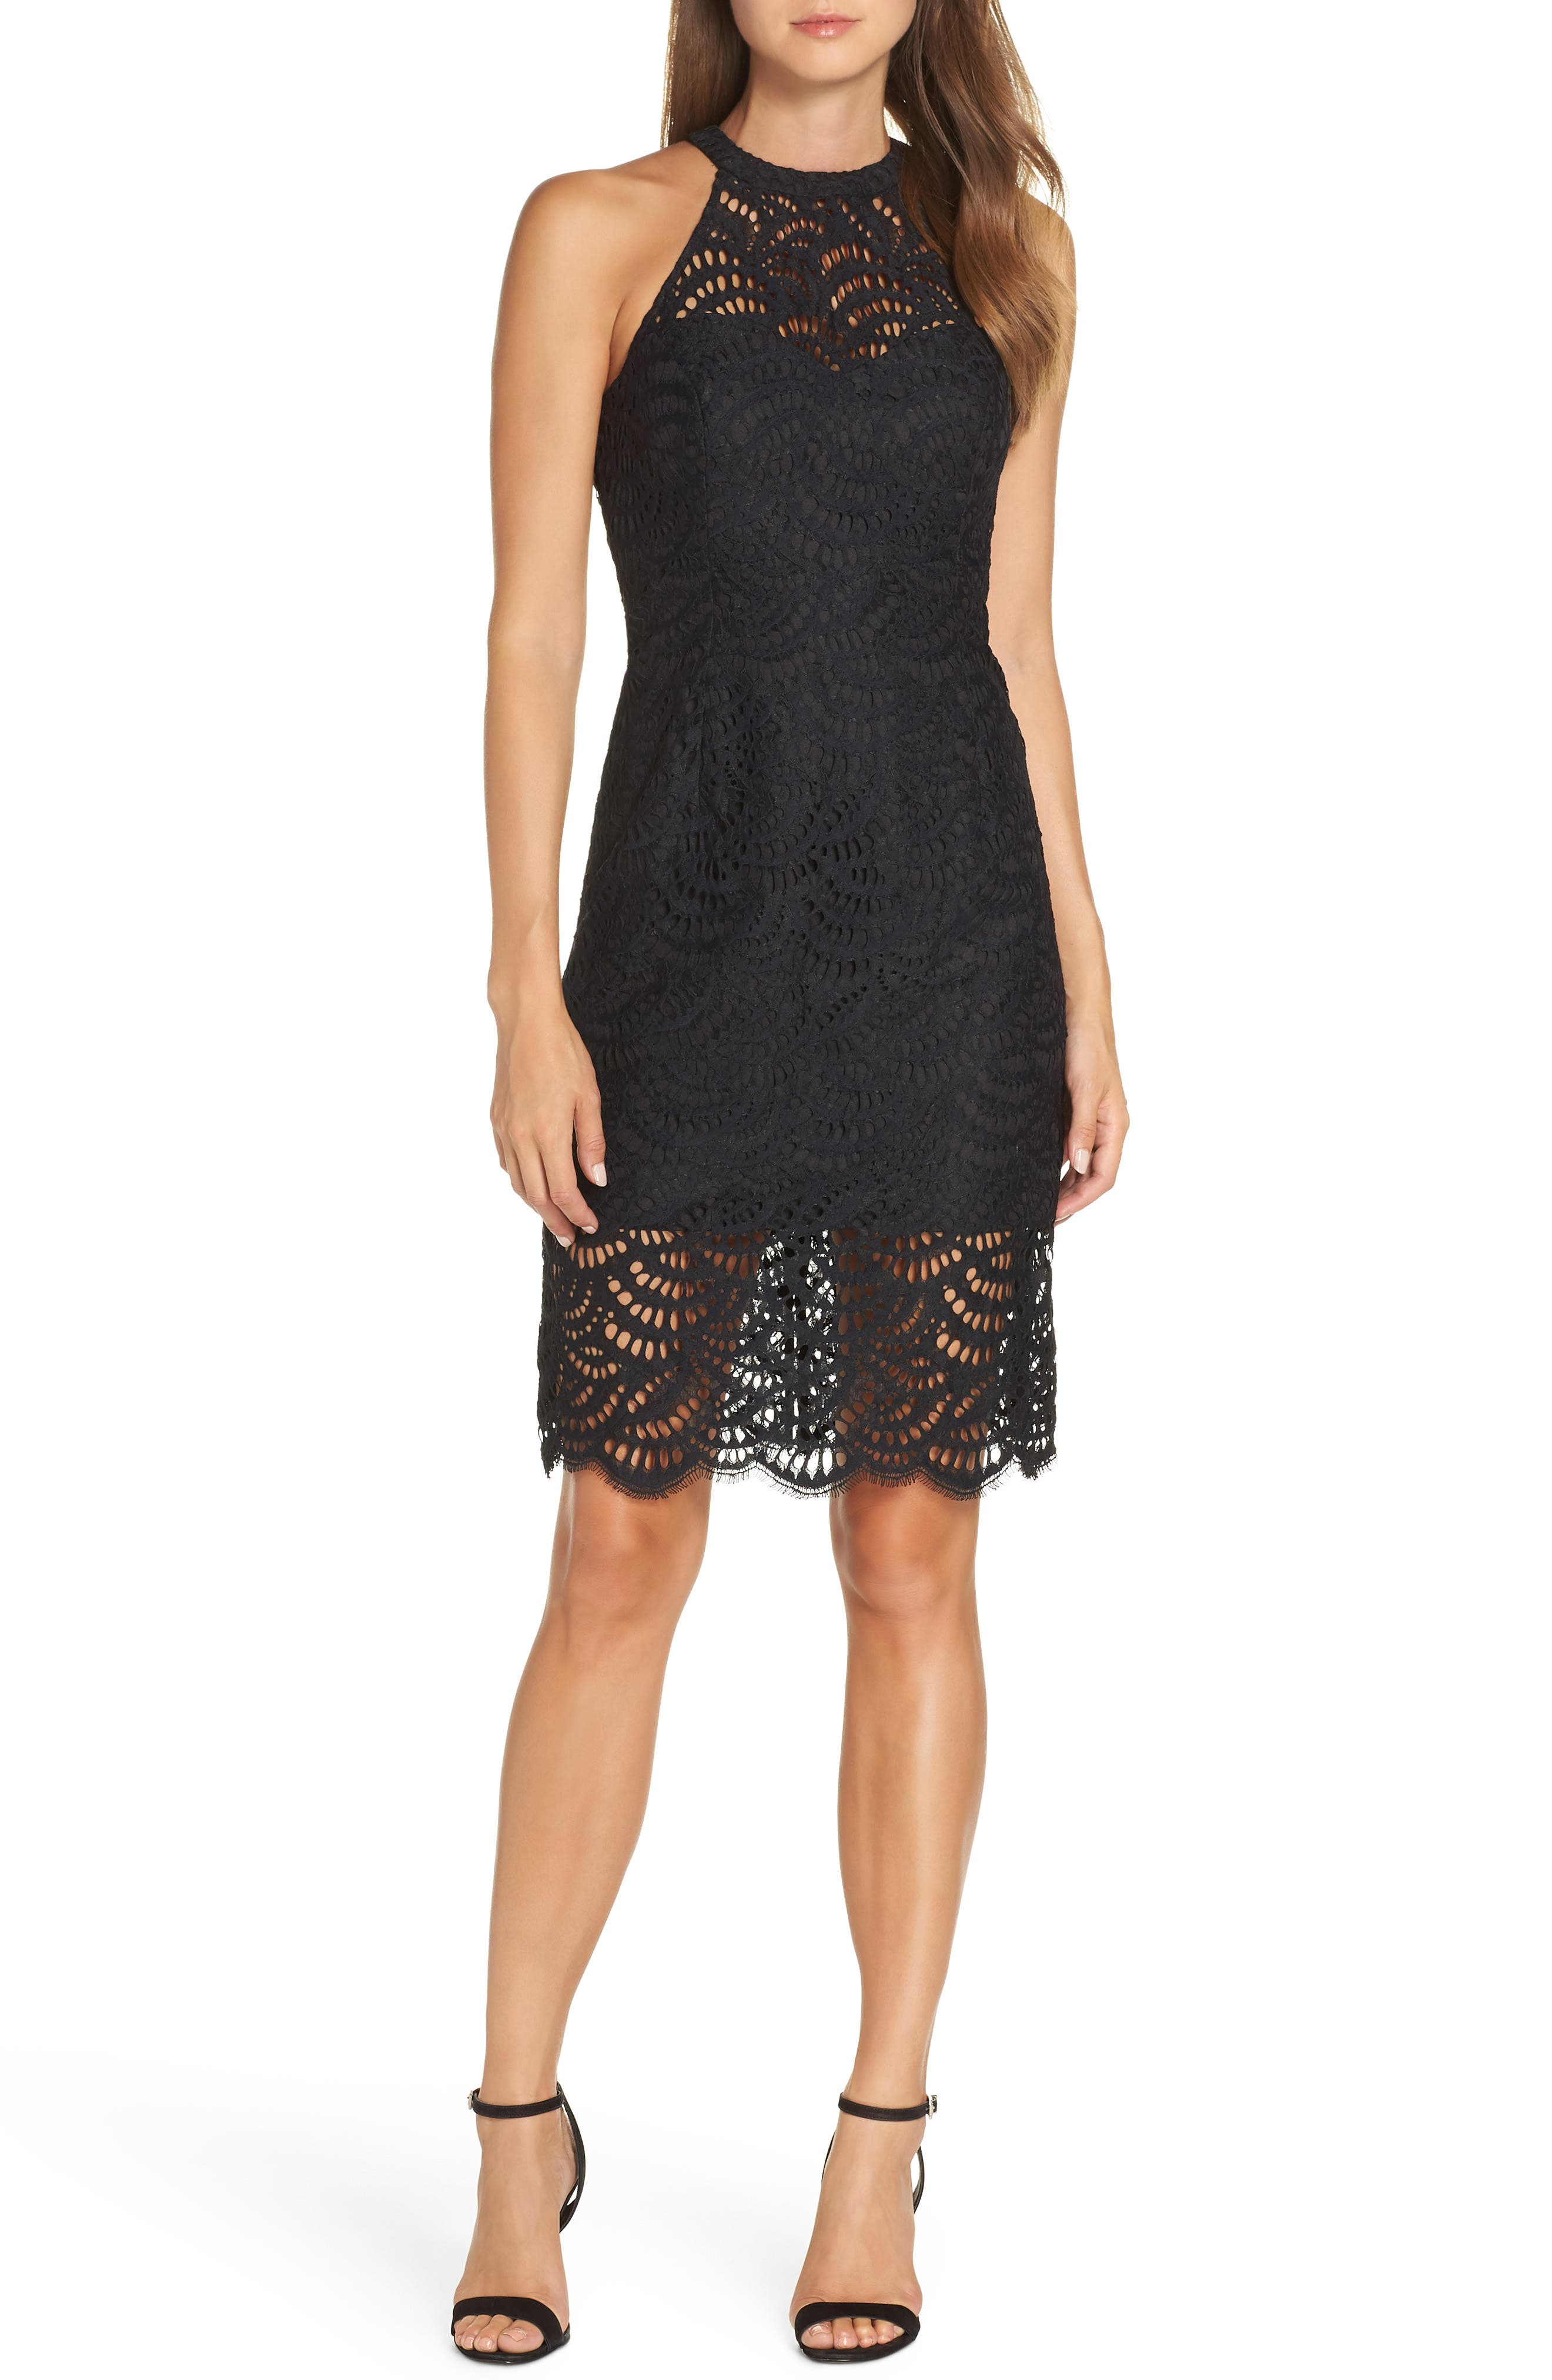 Lilly Pulitzer Kenna Lace Sheath Dress, Black